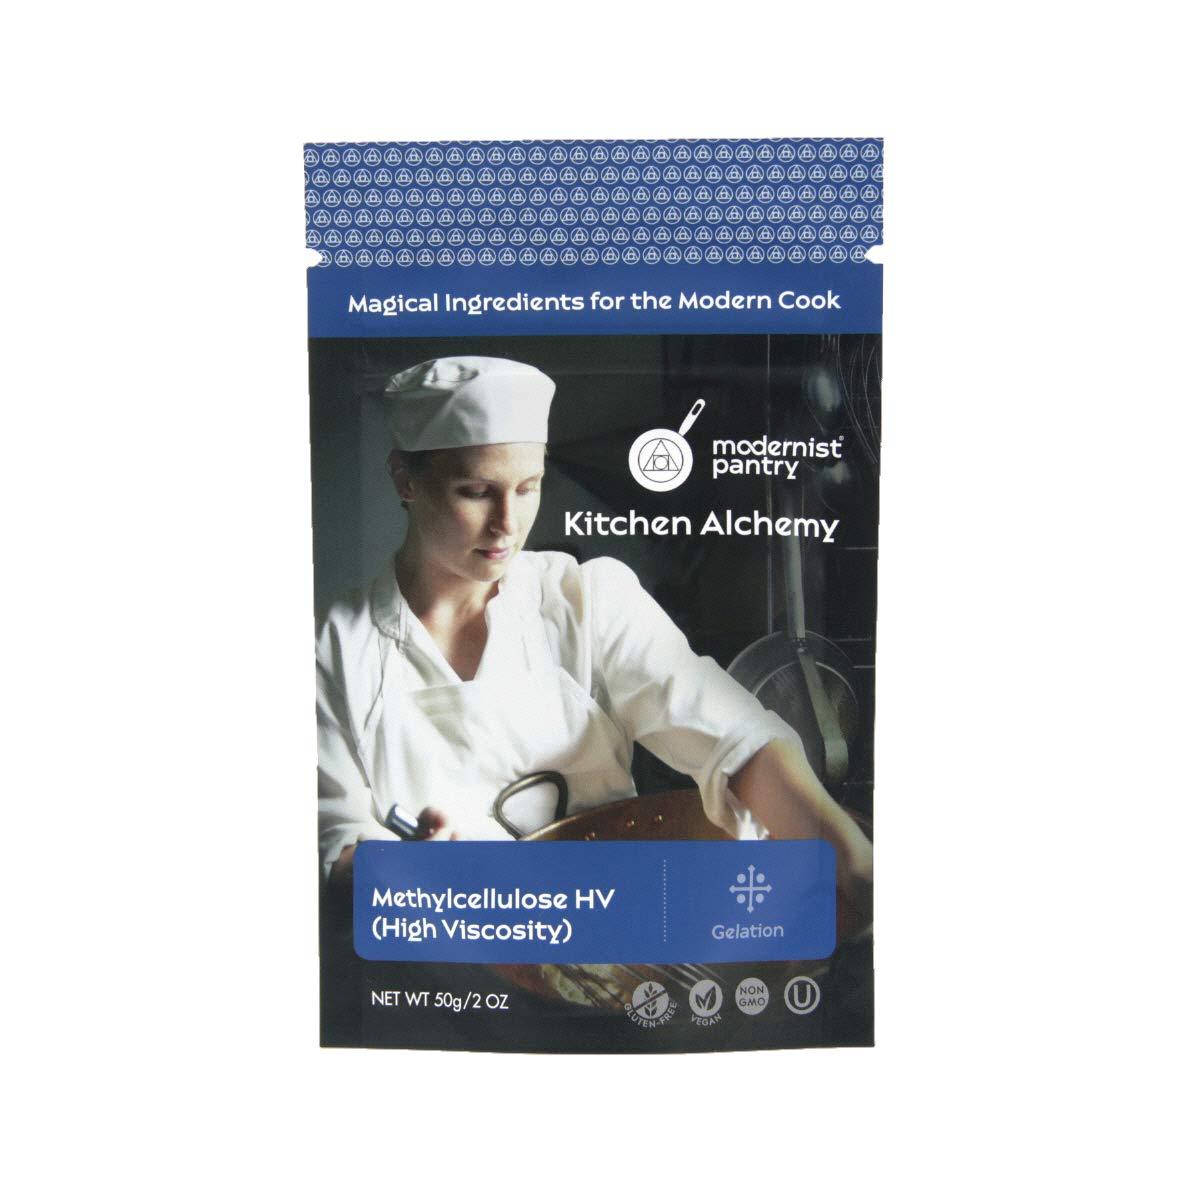 2021 model Pure San Antonio Mall Methylcellulose - High Viscosity ☮ Non-GMO ⊘ Vega